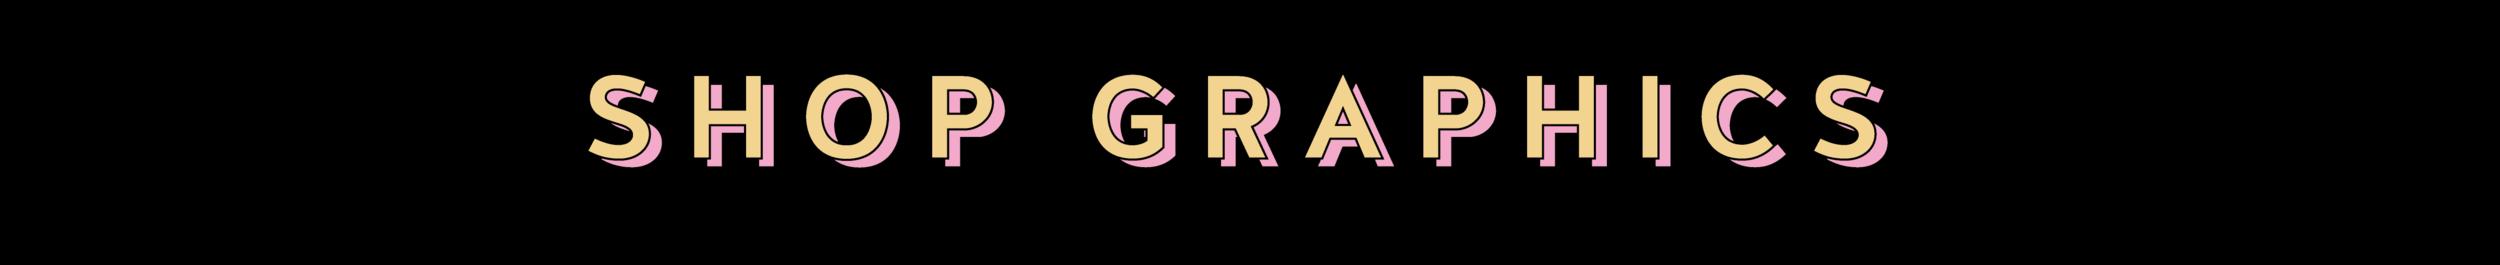 Shop-Graphics-01.png